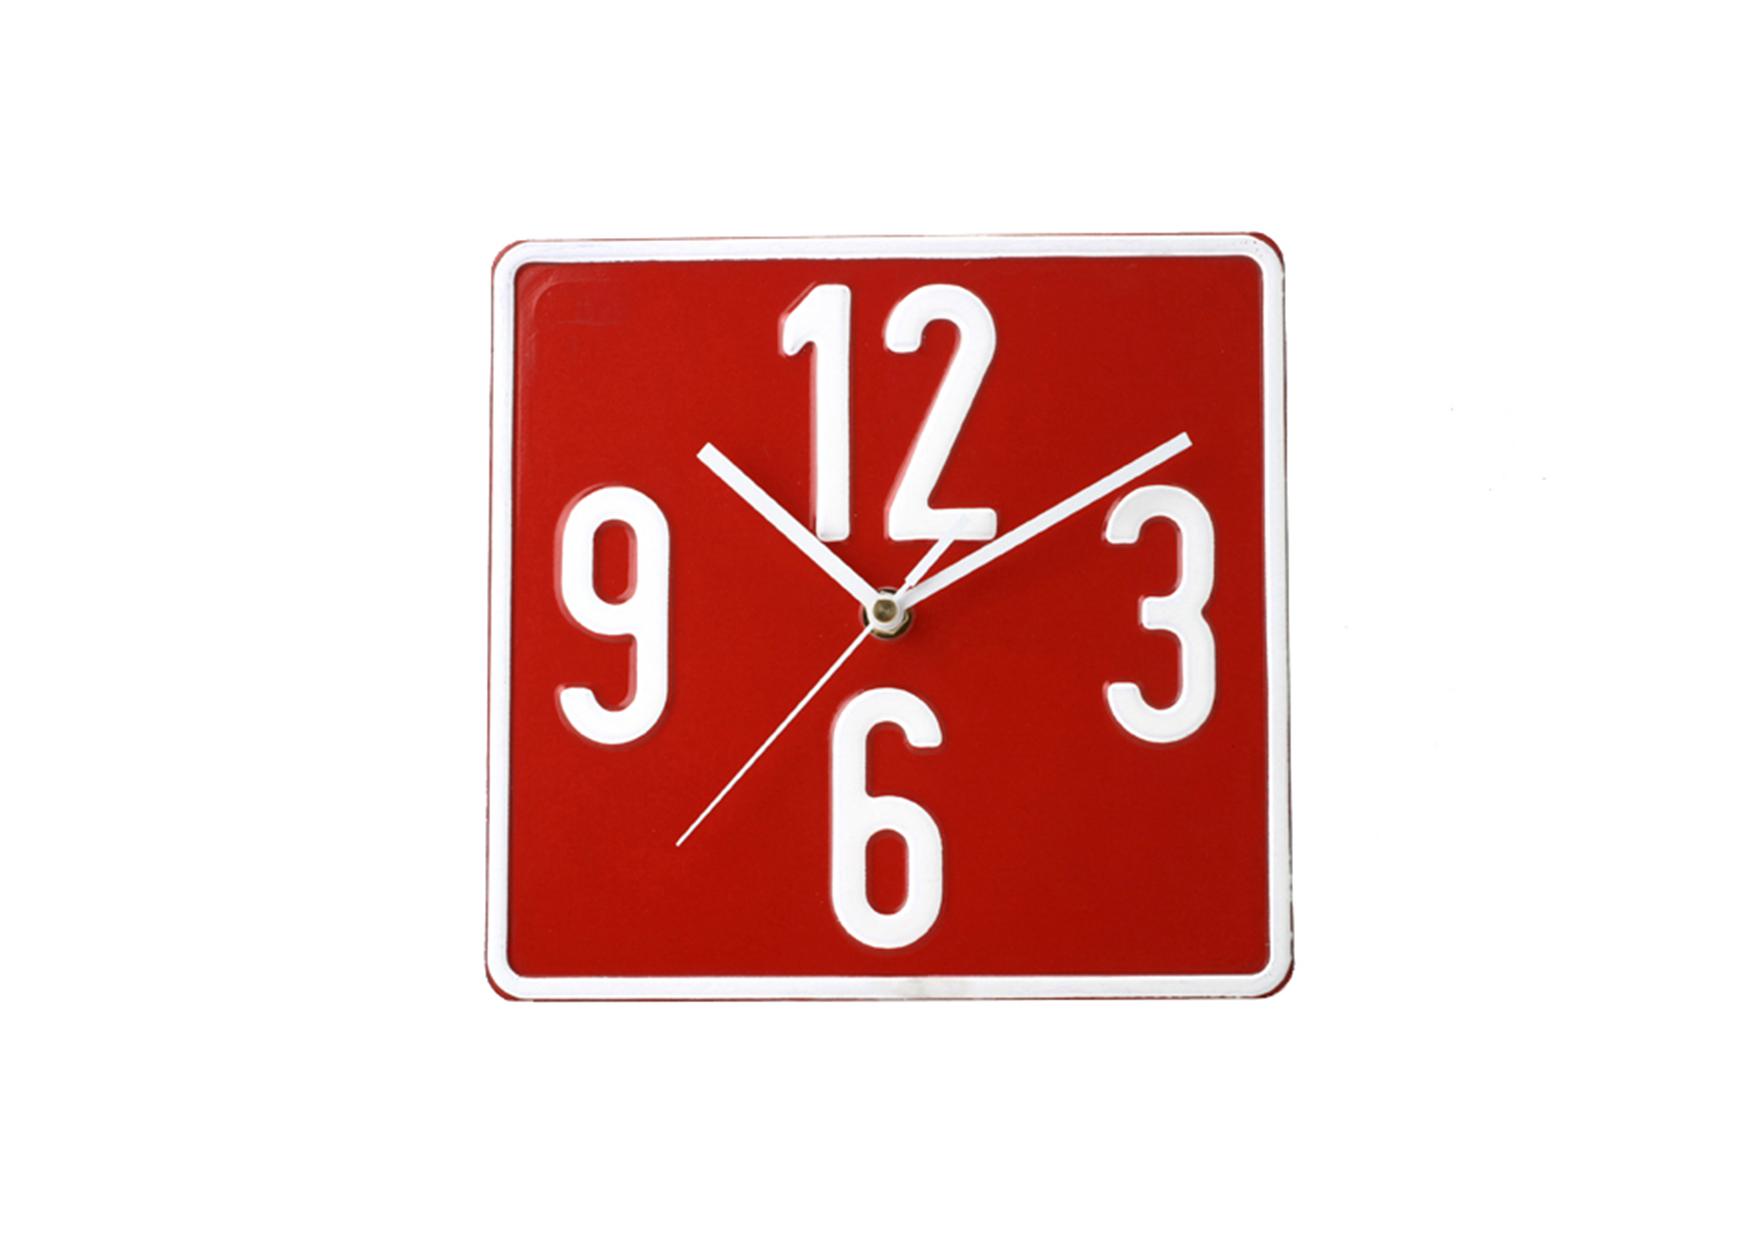 clock-red(300) 4.jpg